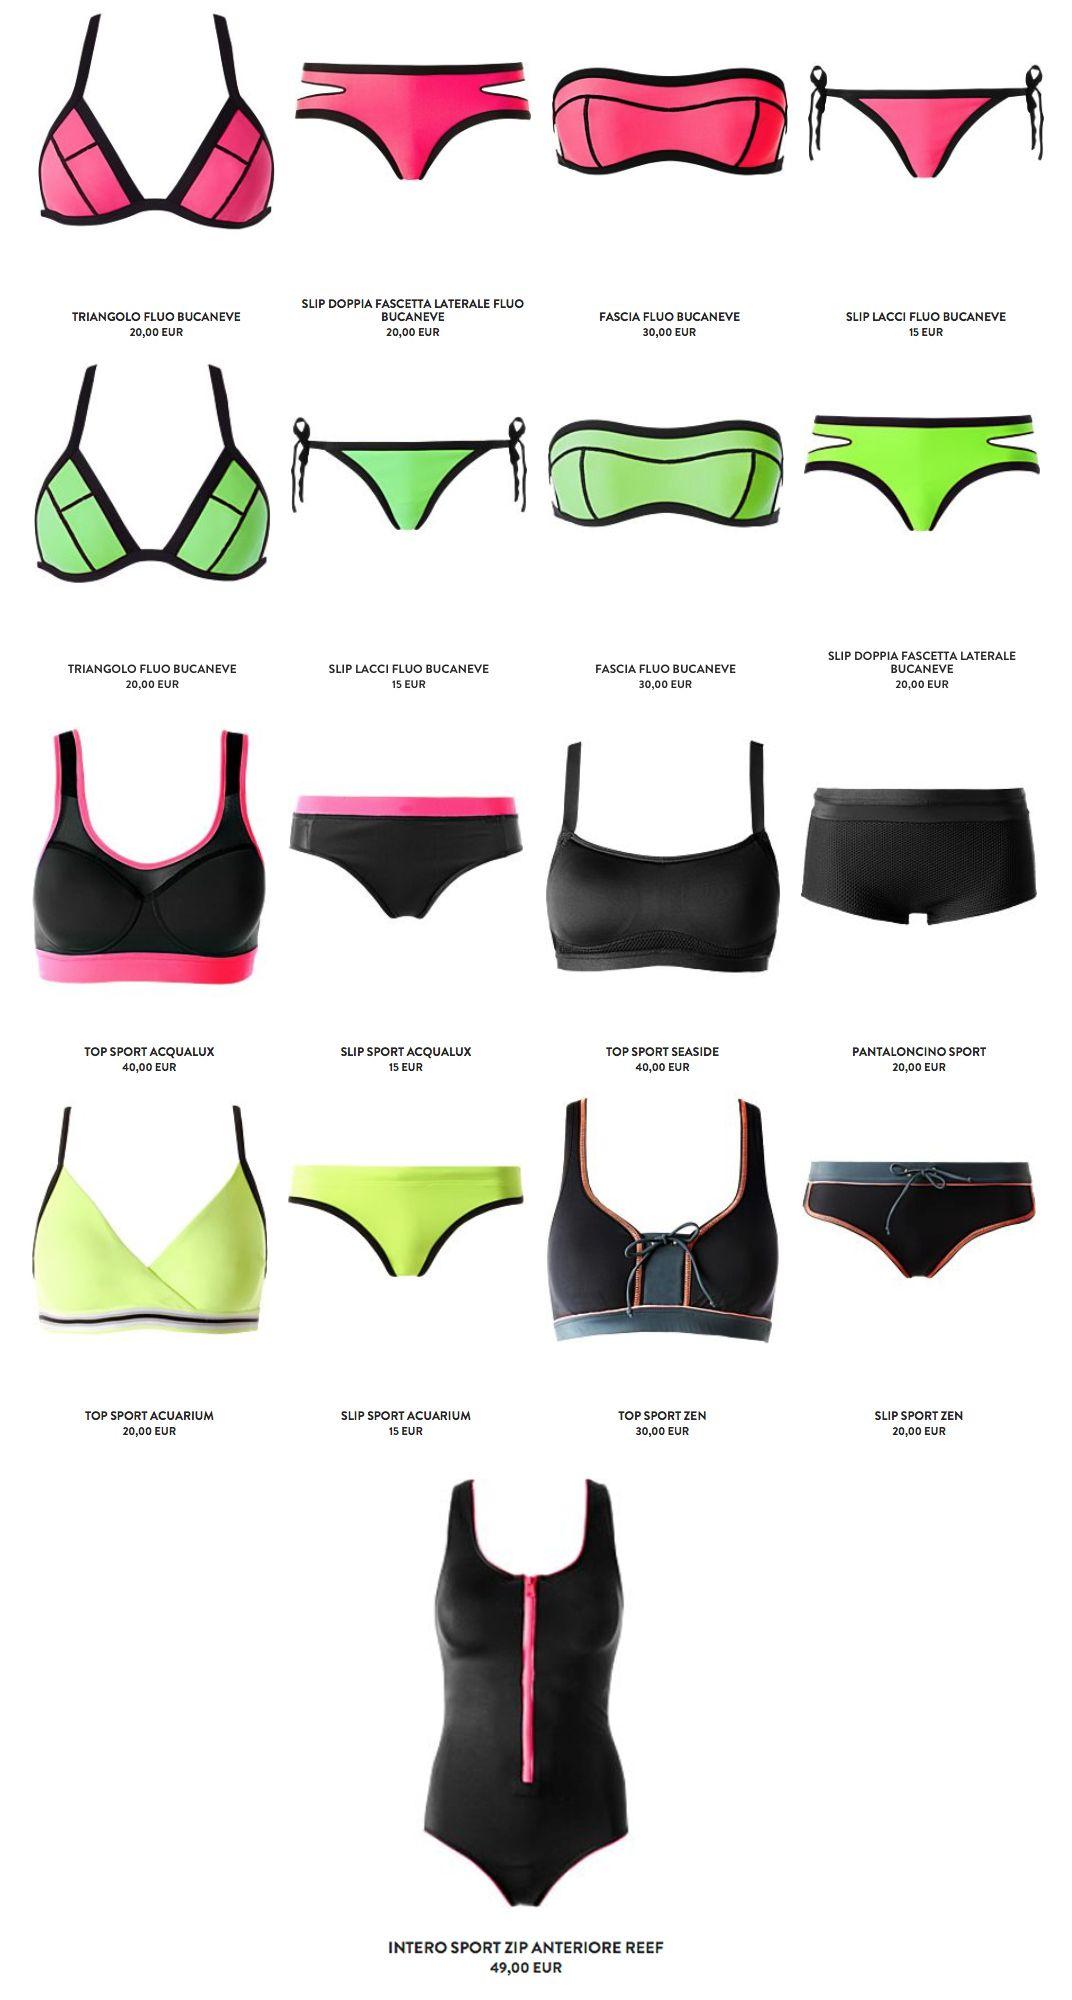 64ece1e0f042 calzedonia costumi 2016 neoprene sport | Beachwear | Costumi ...